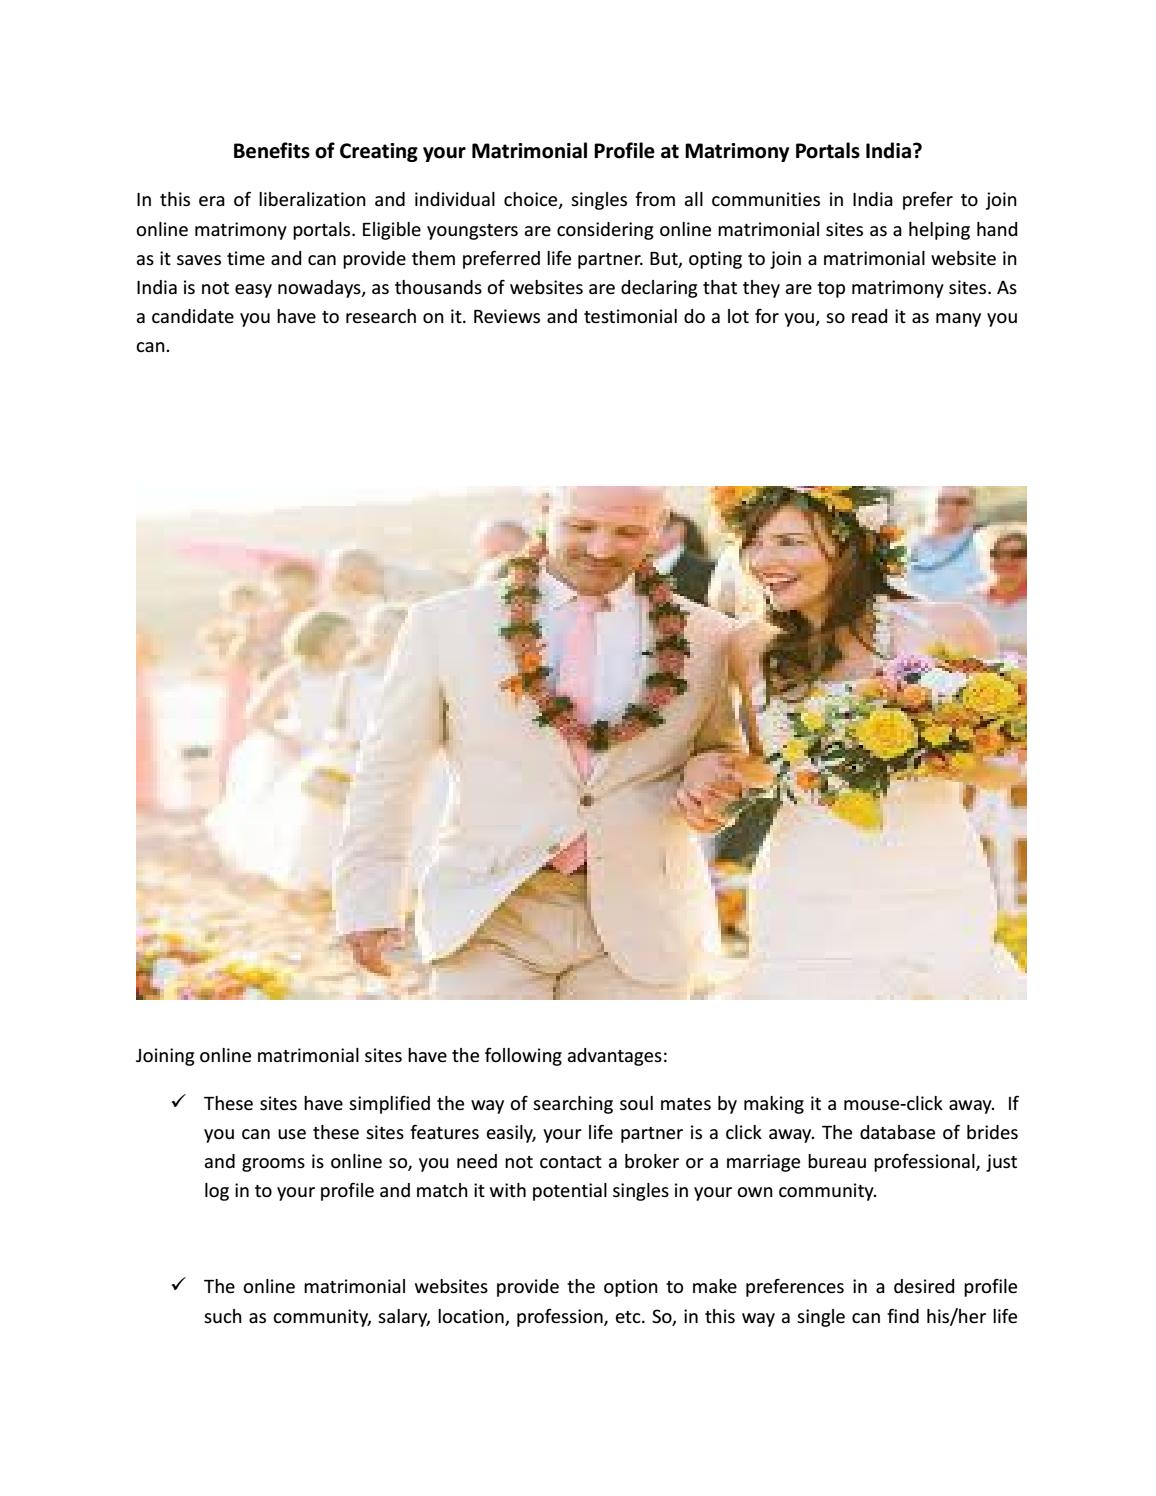 India's Fasted Growing Matrimonial Website For Jain by Jainwedding